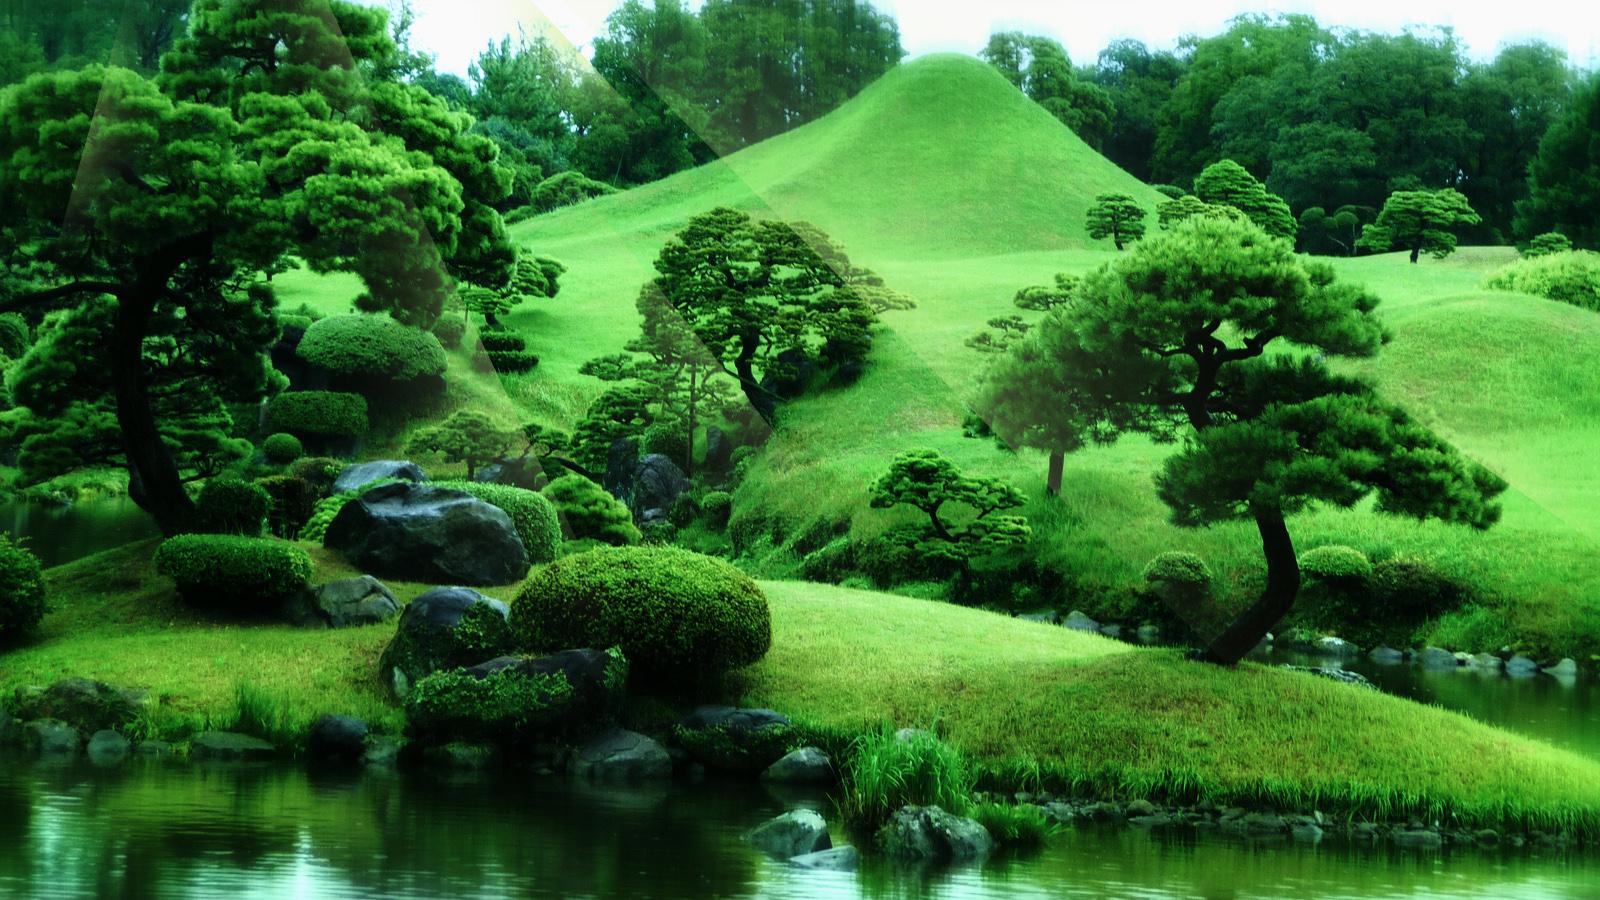 Fond D écran Zen Nature